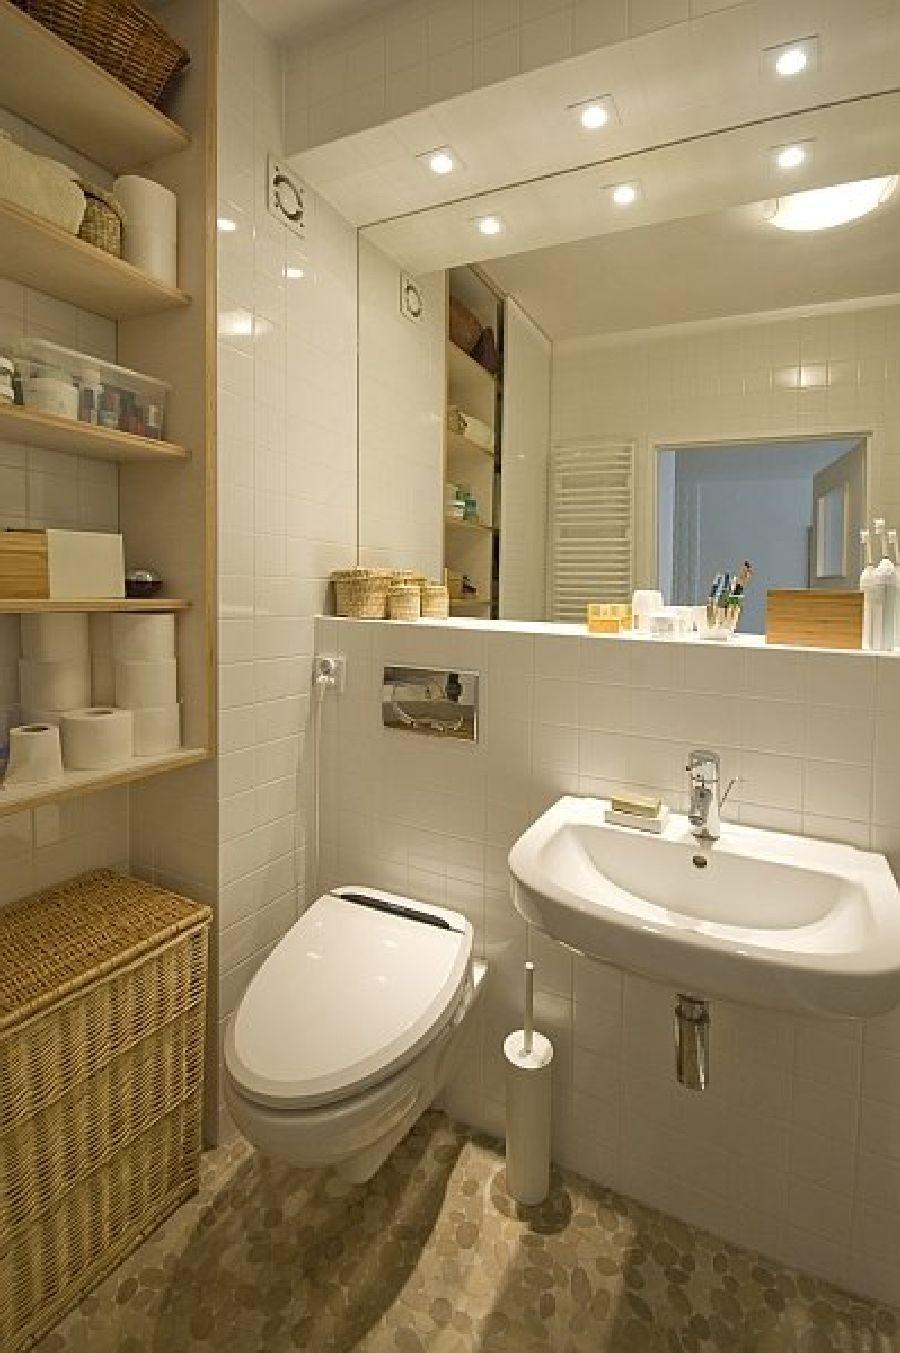 adelaparvu.com despre apartament 41 mp cu doua paturi matrimoniale, design interior arh Daria Pietryka (17)